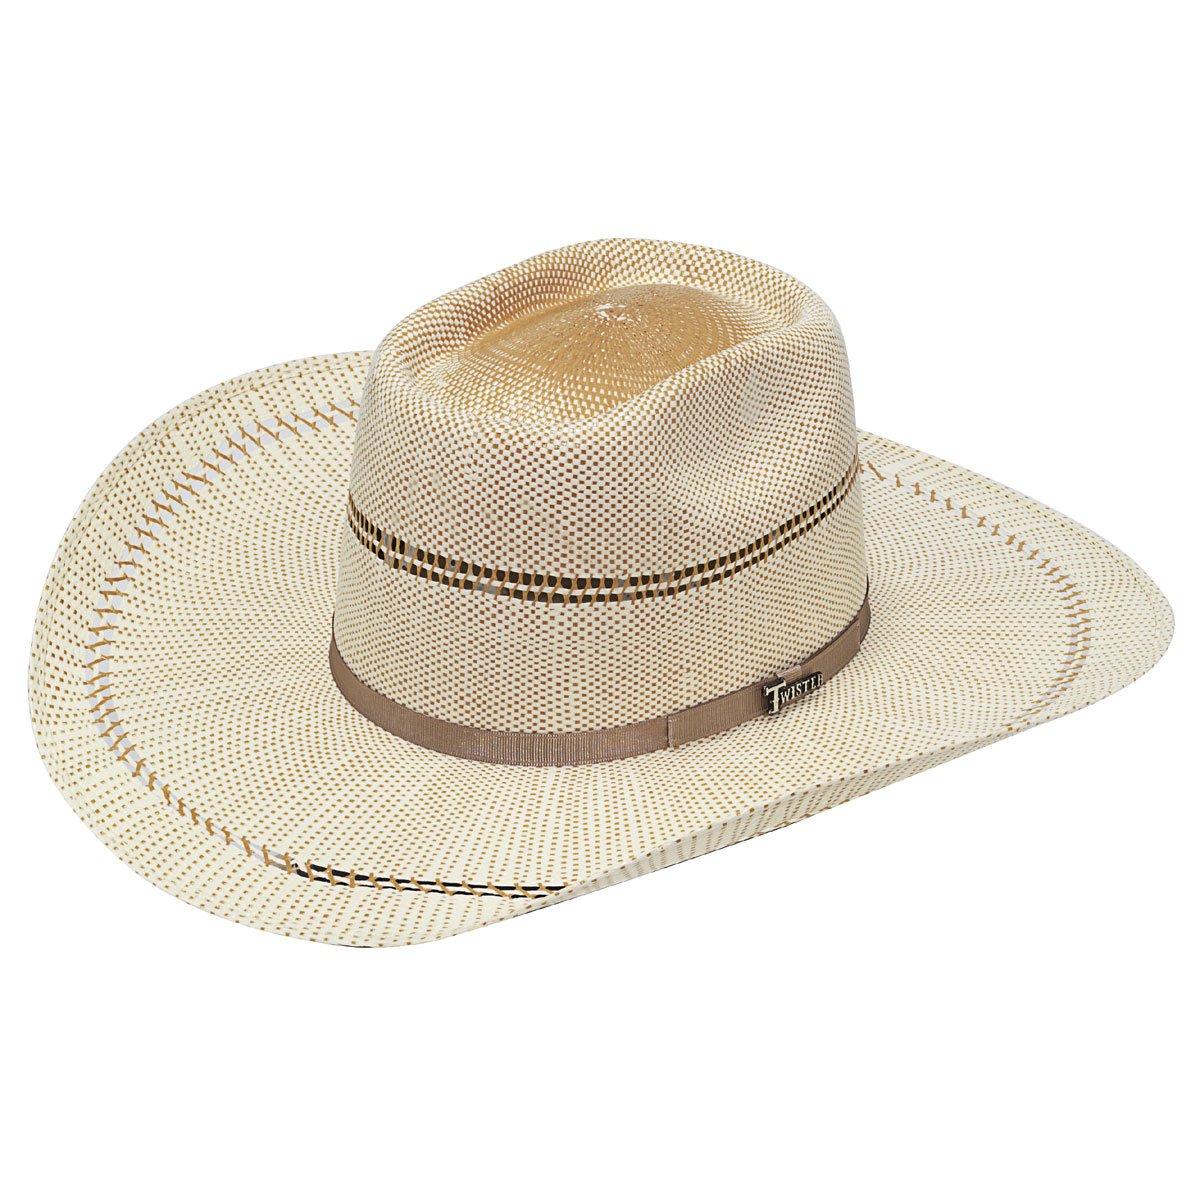 Bangora Straw Hat fromTwister